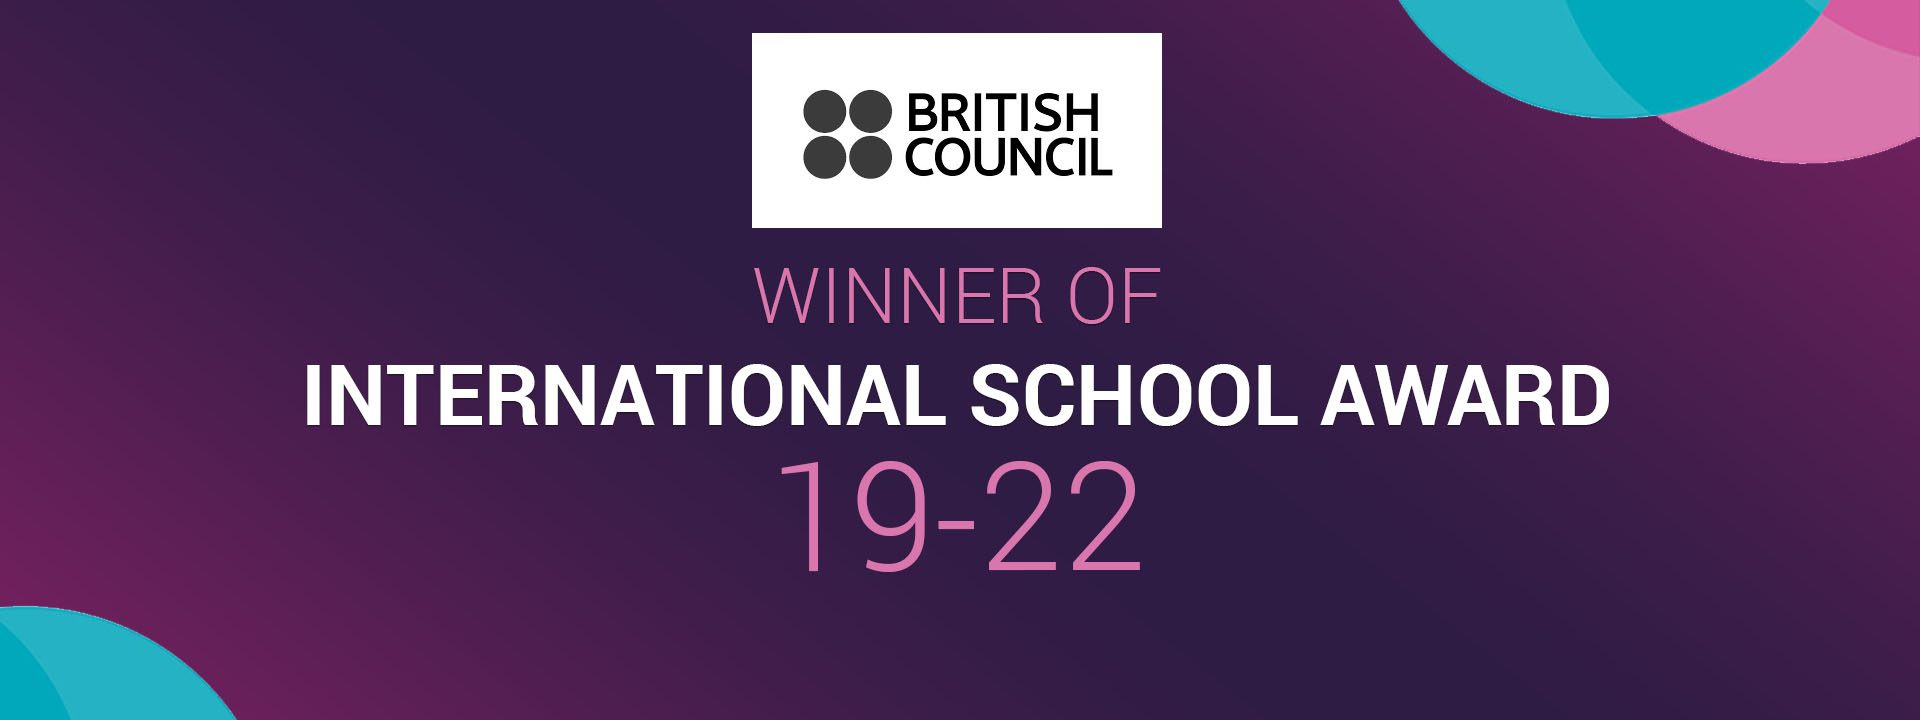 WINNING OF INTERNATIONAL SCHOOL AWARD HFS